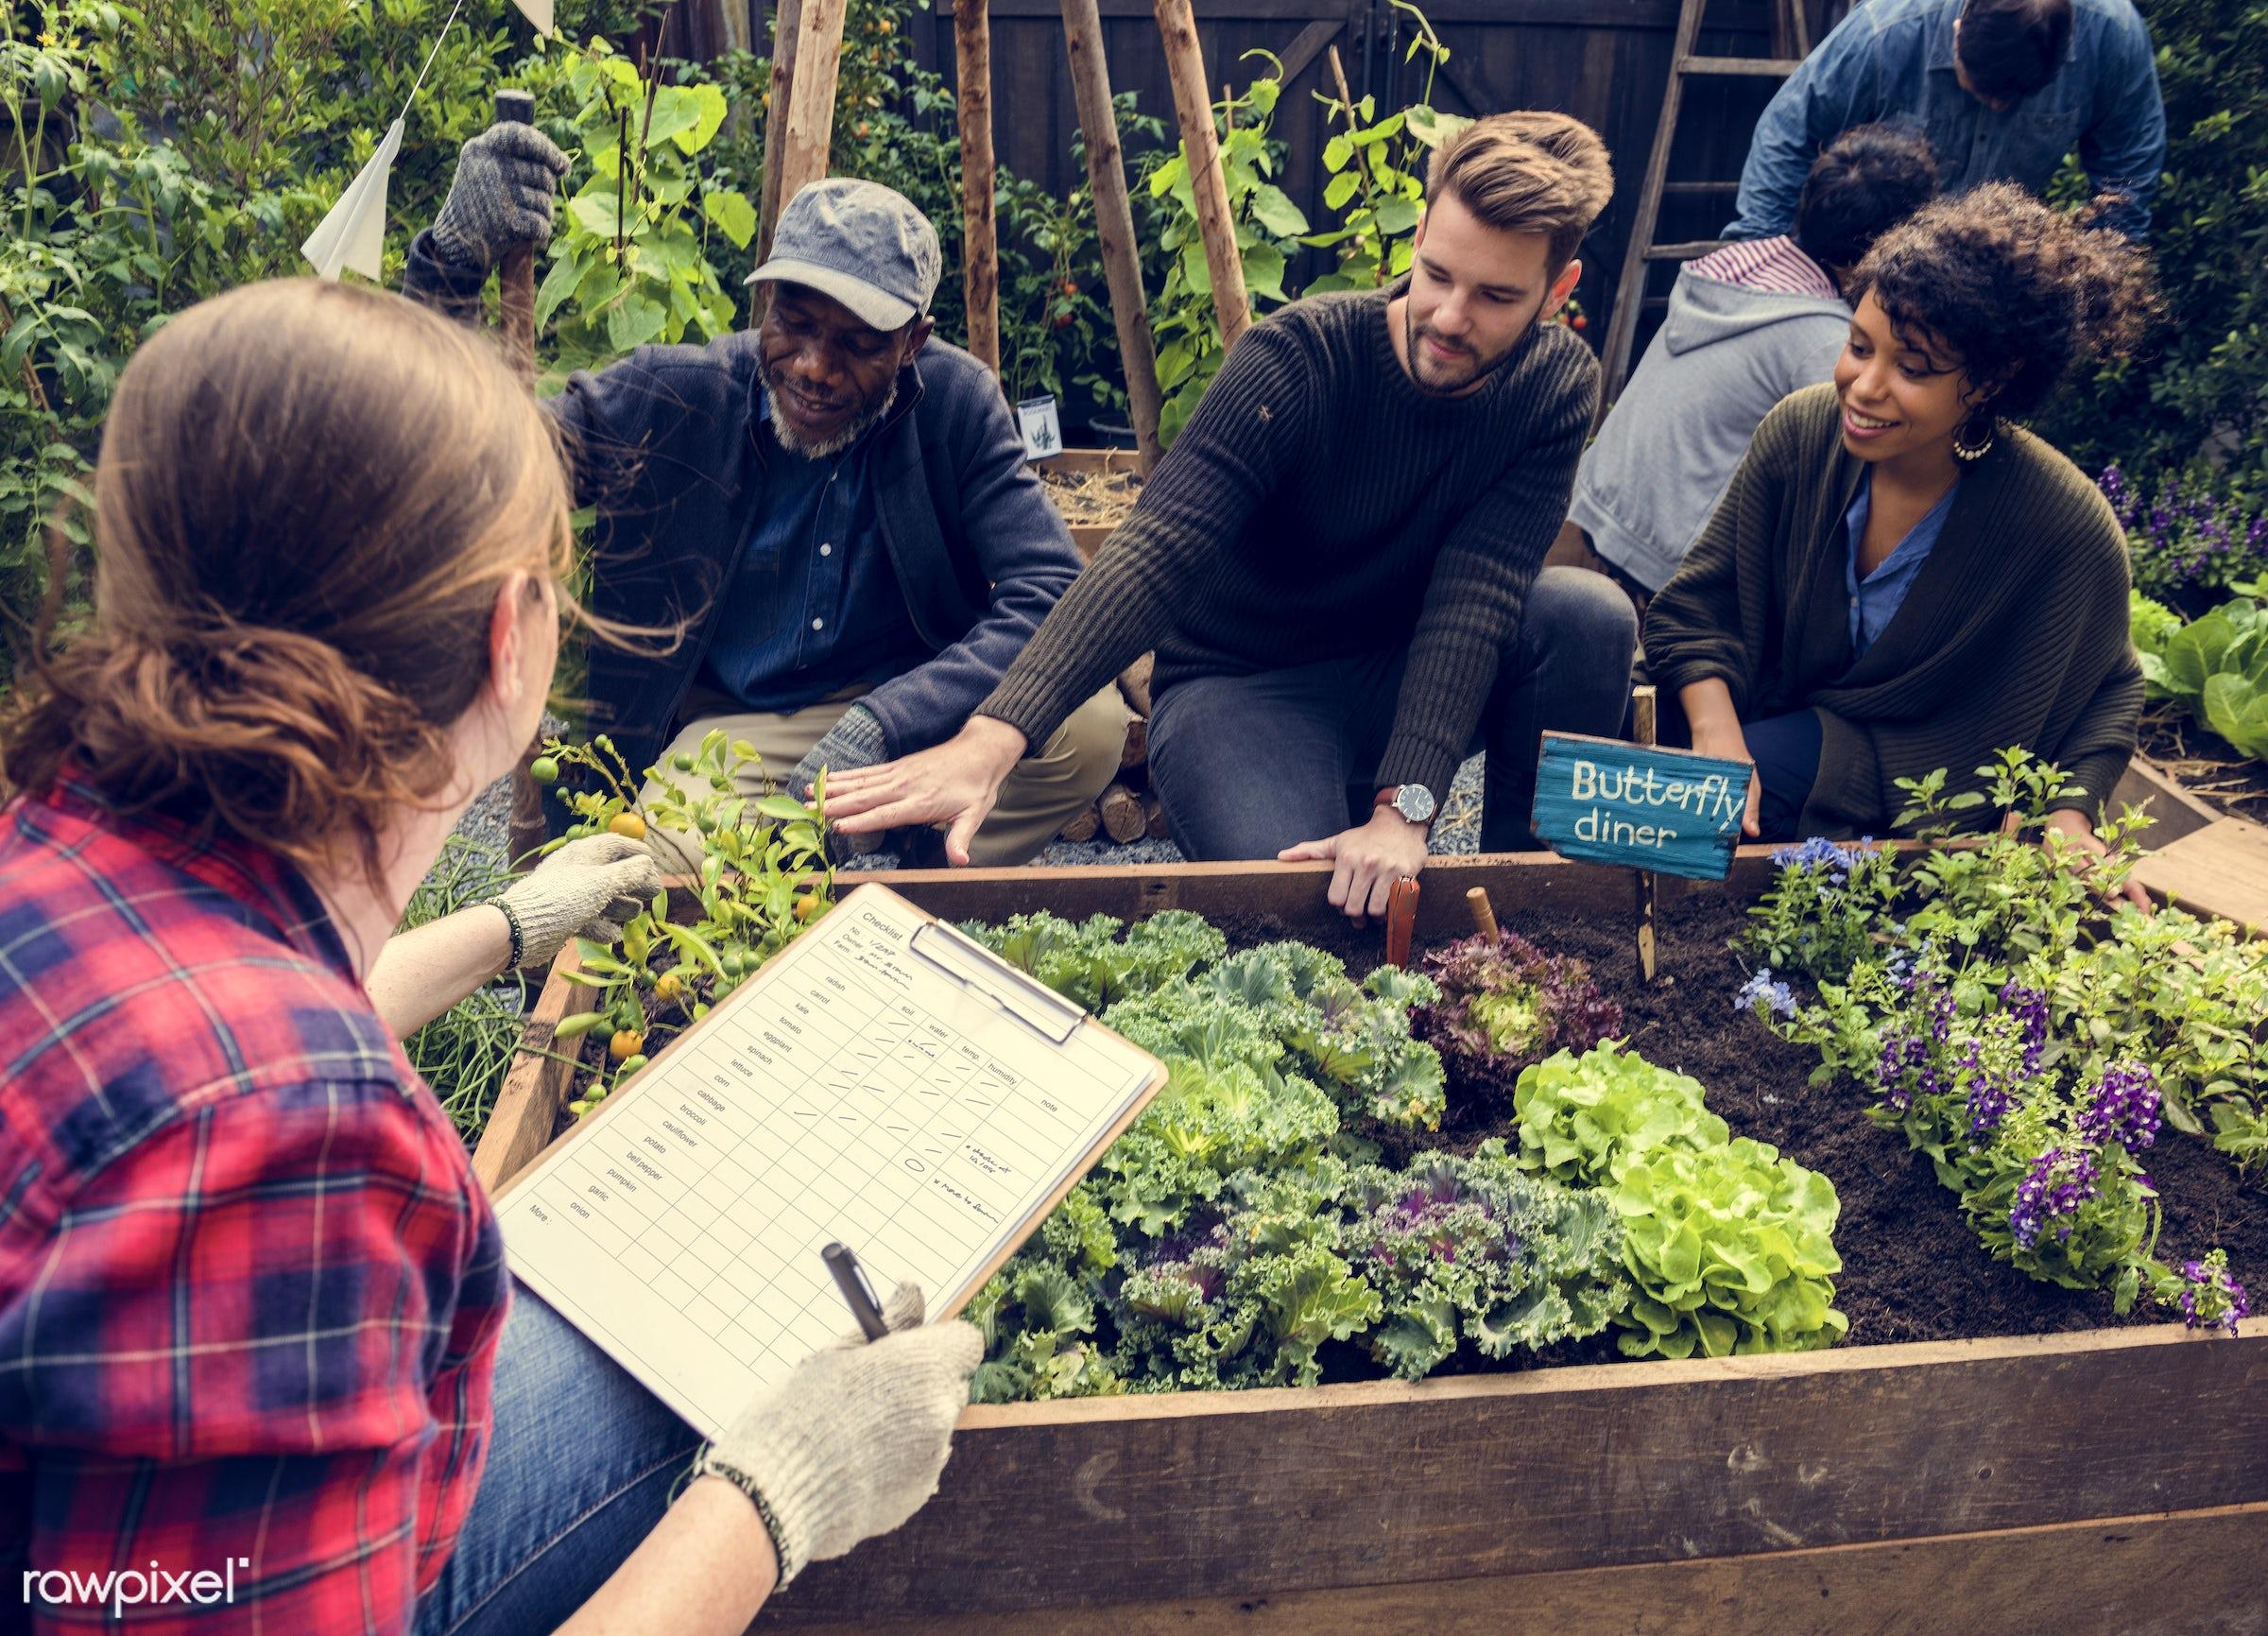 plant, nutritious, greenhouse, writing, friends, farmer, fresh, lettuce, healthy eating, friendship, men, checking, flower,...